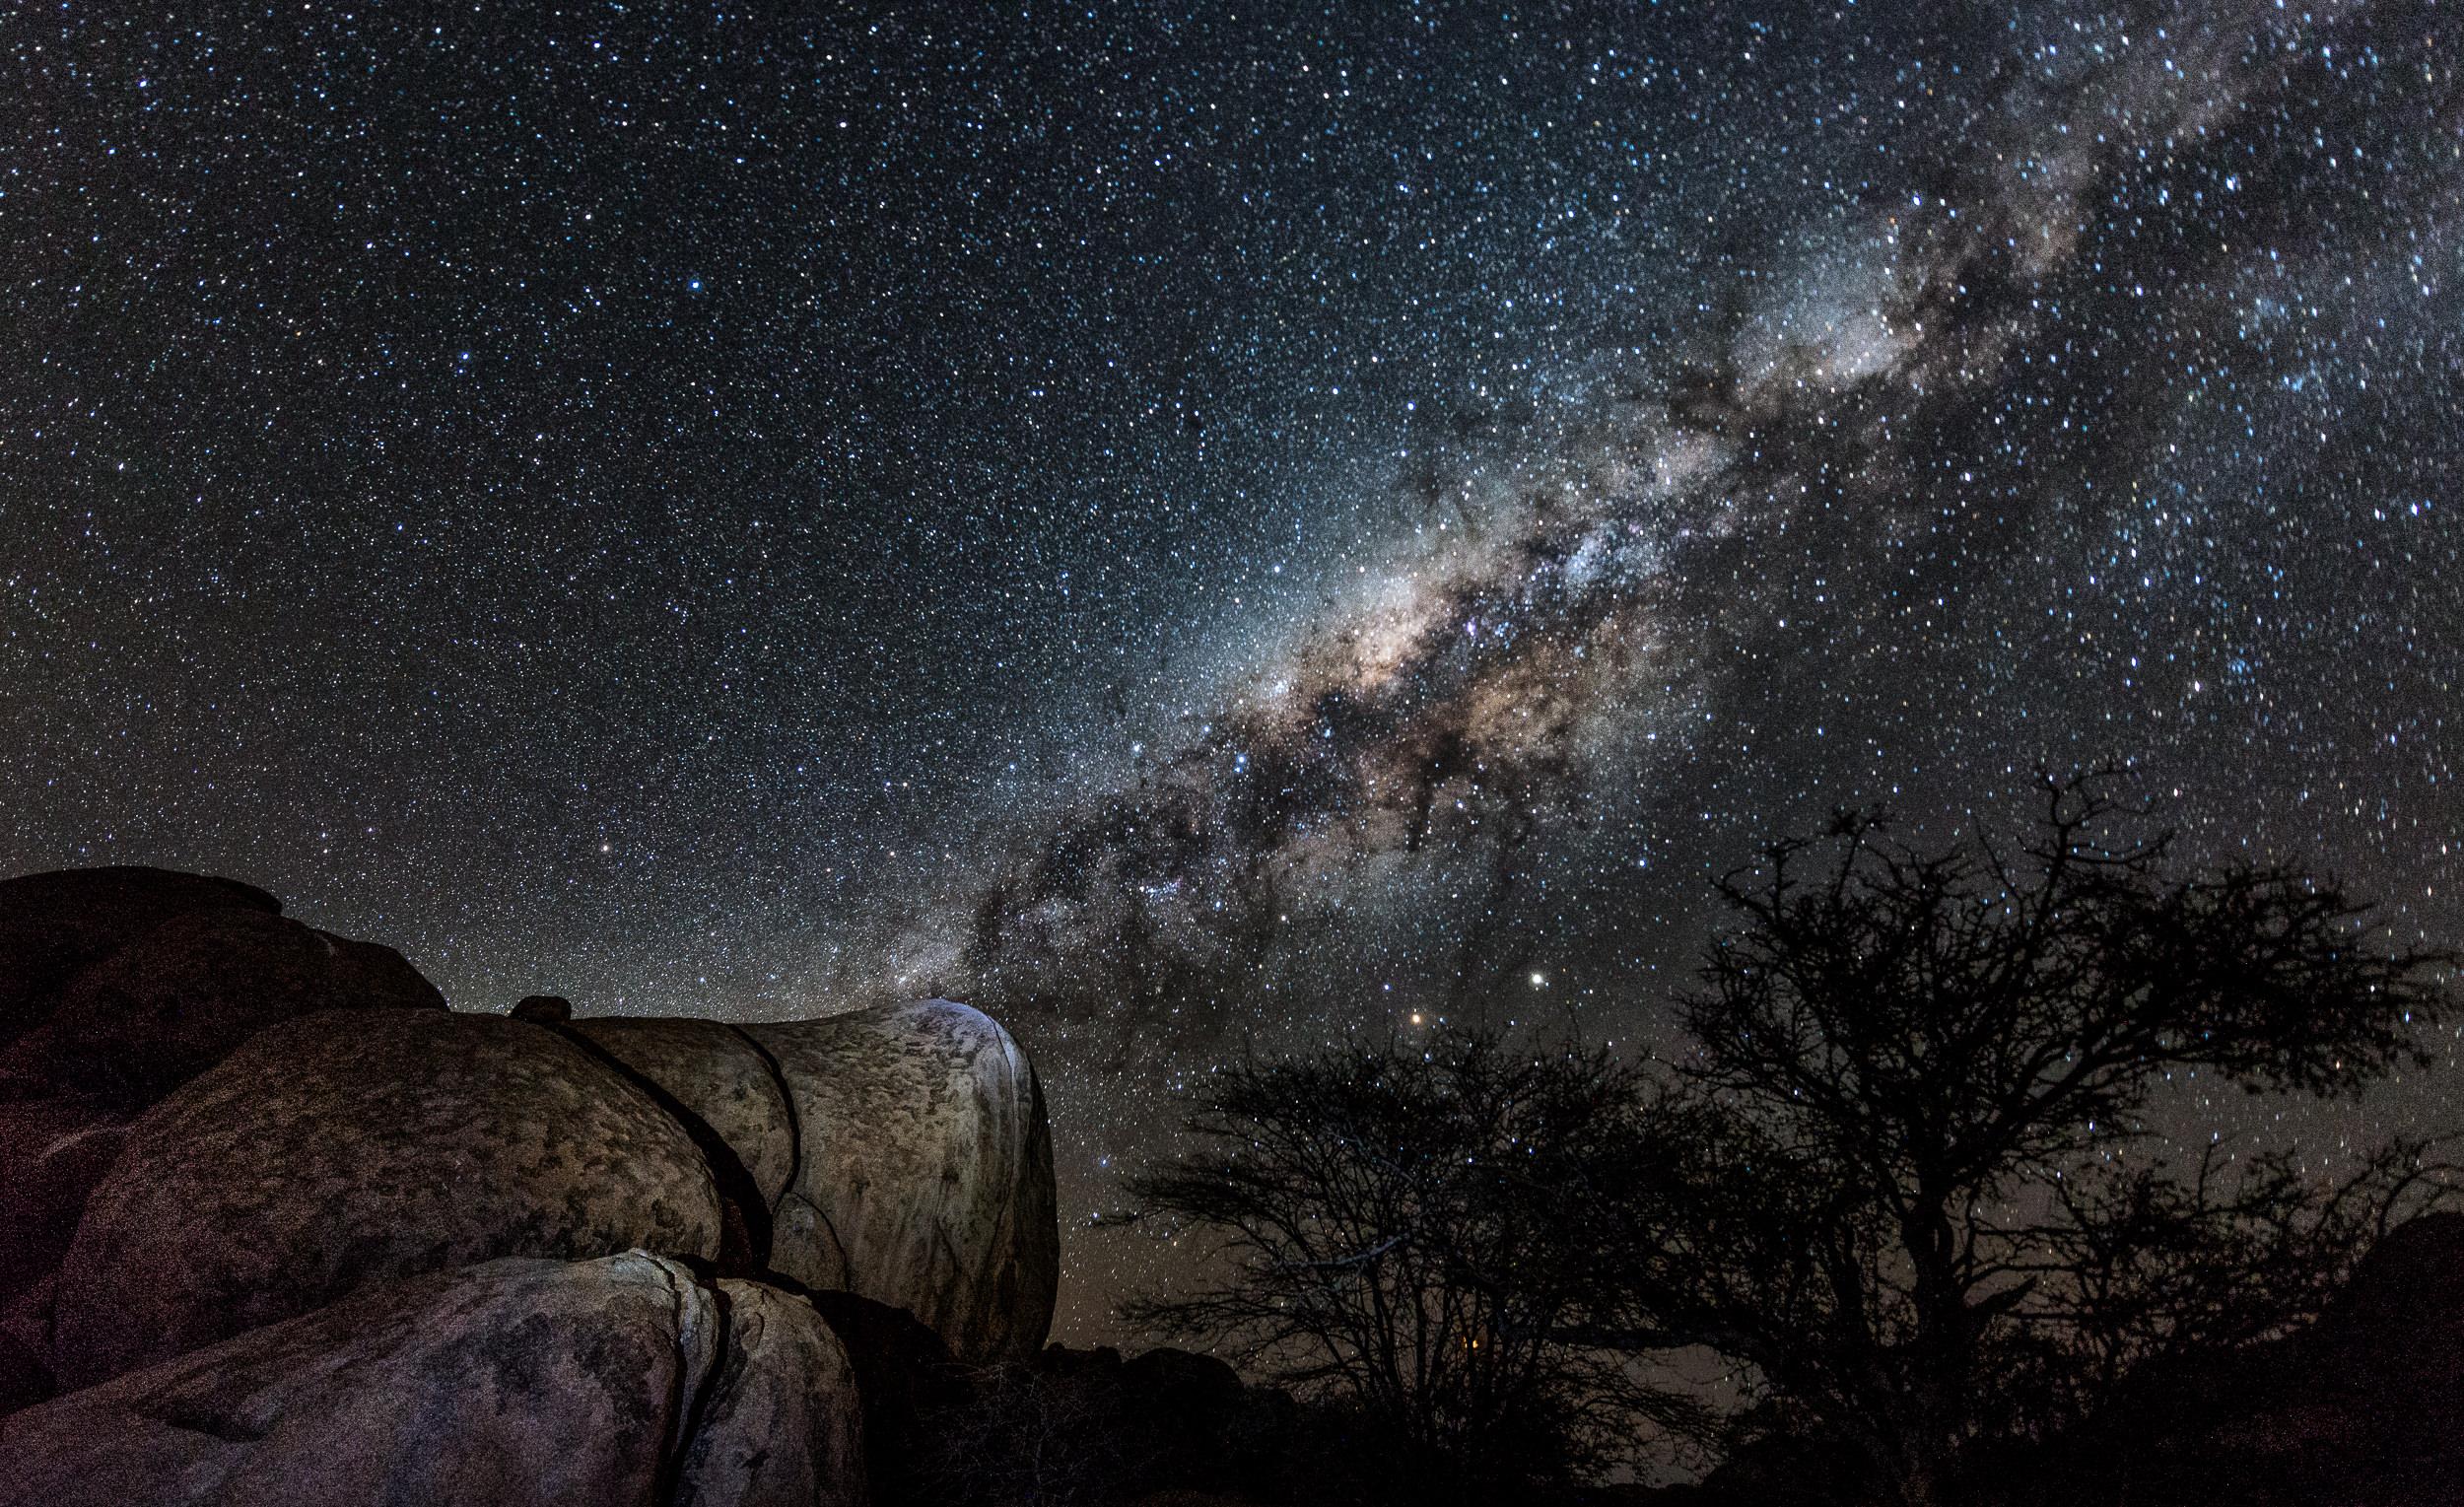 [2016 06 16] Namibia Spitzkoppe (NIKON D800) 7962-Edit.jpg